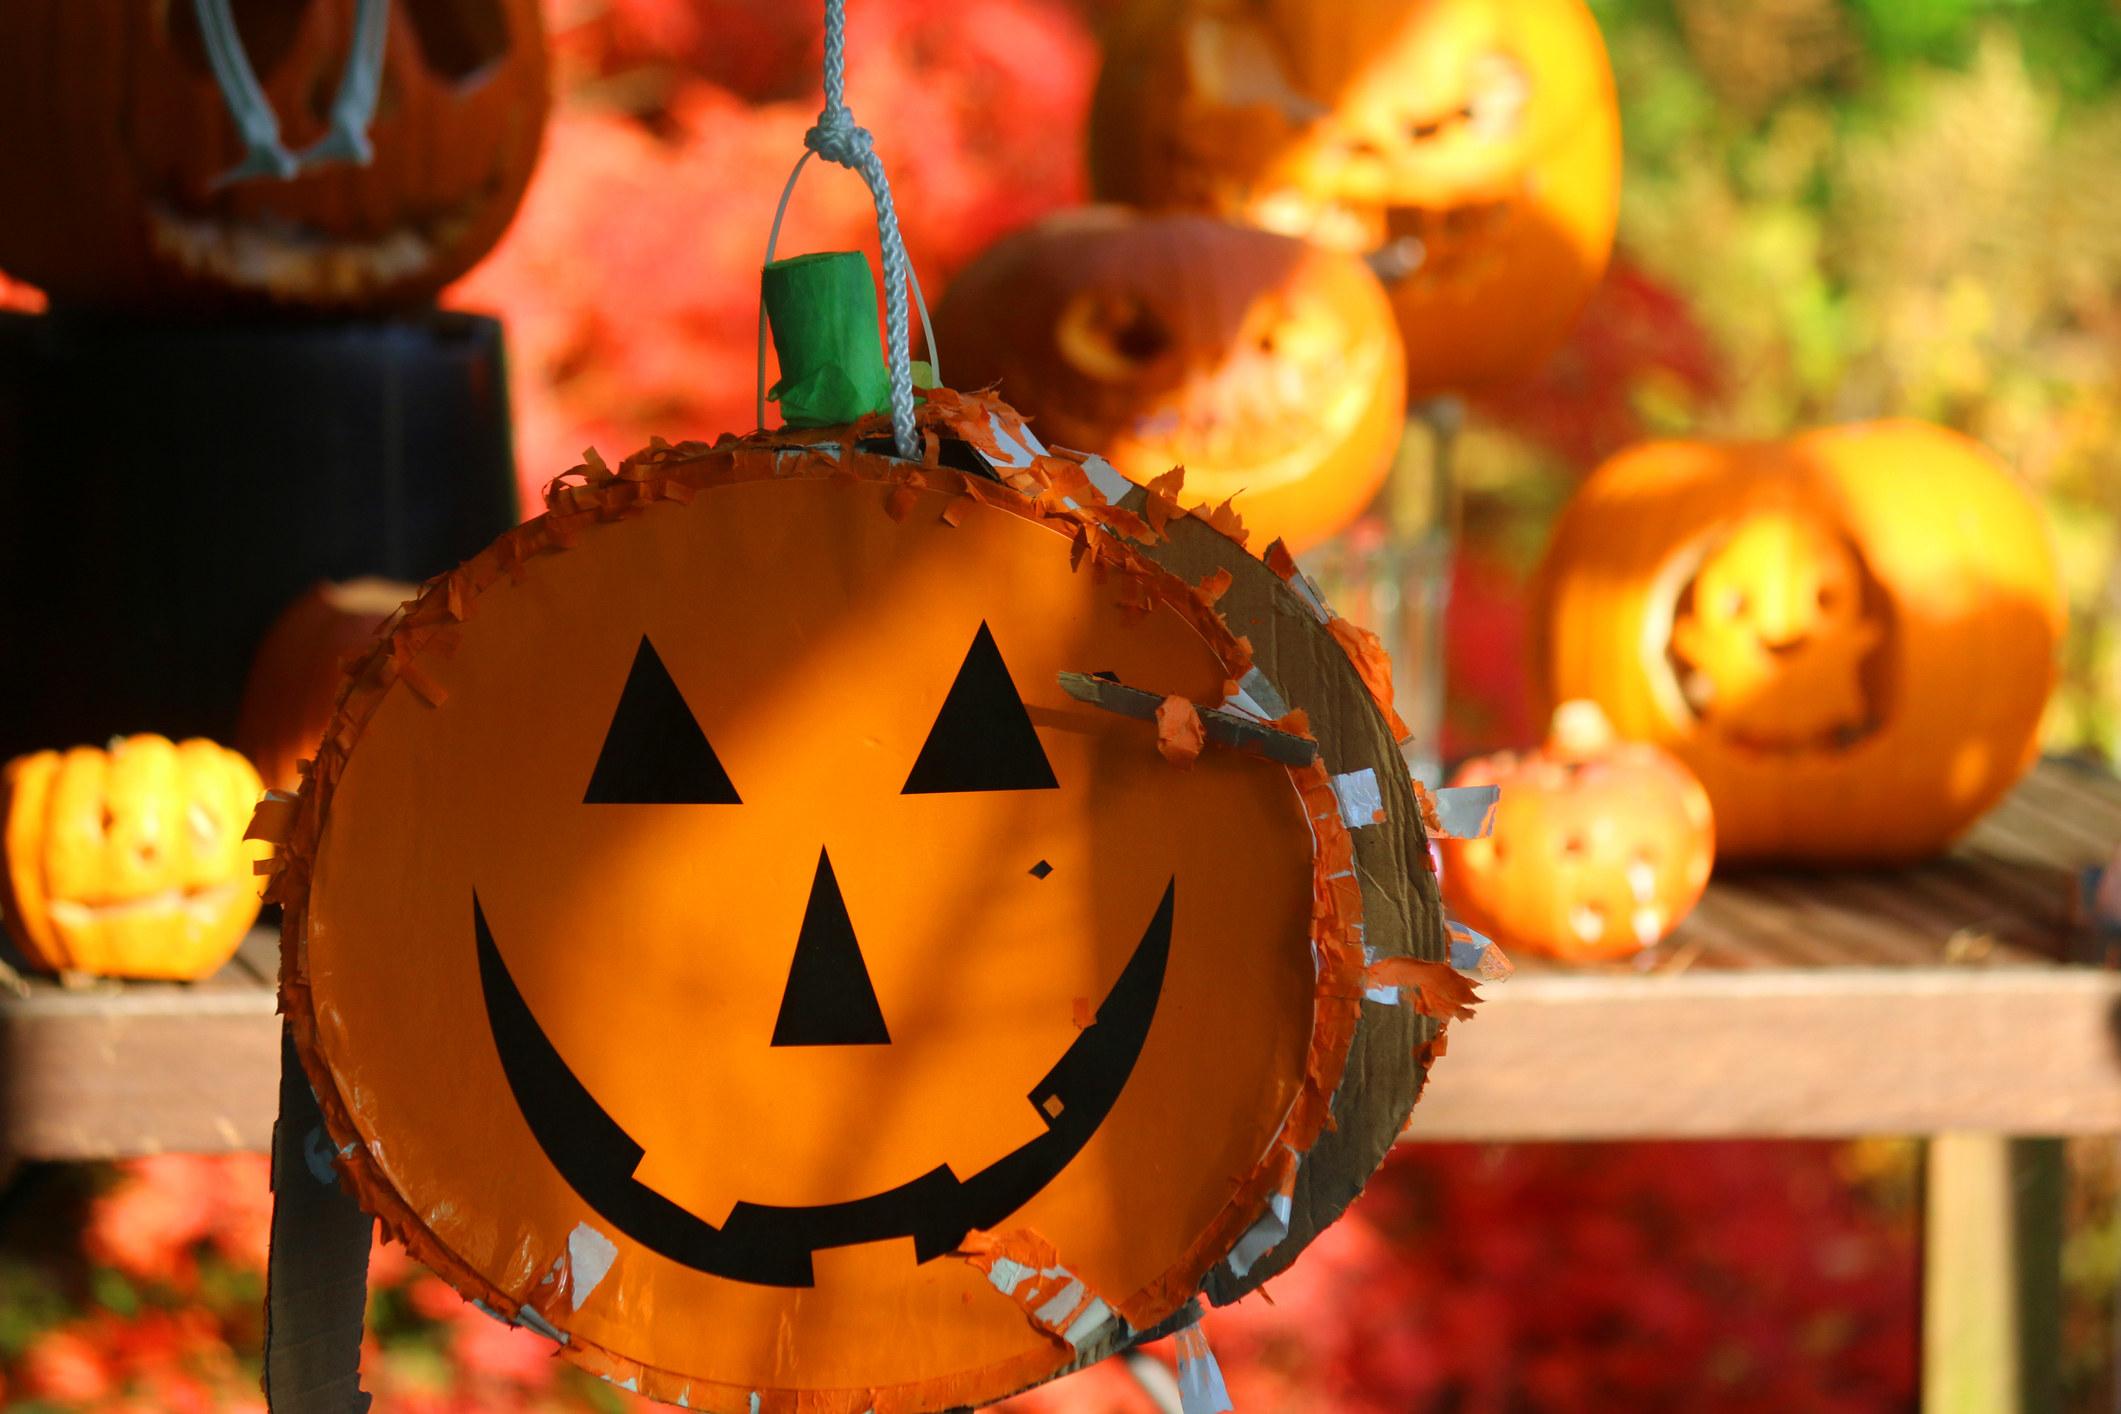 An image of a jack-o'-lantern piñata.